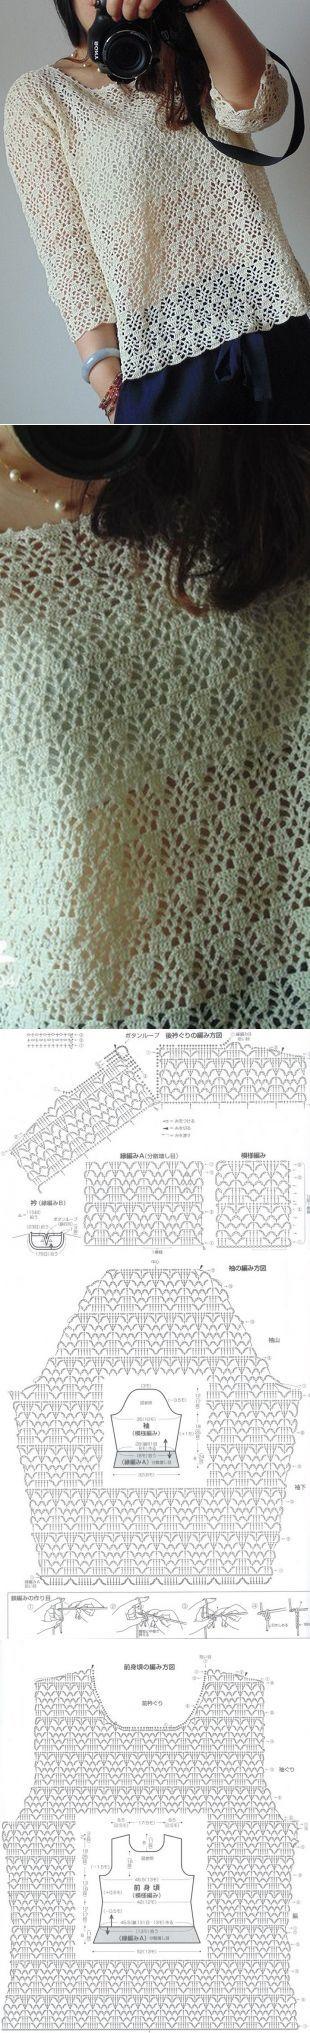 675 best alma images on Pinterest | Knit crochet, Crochet patterns ...